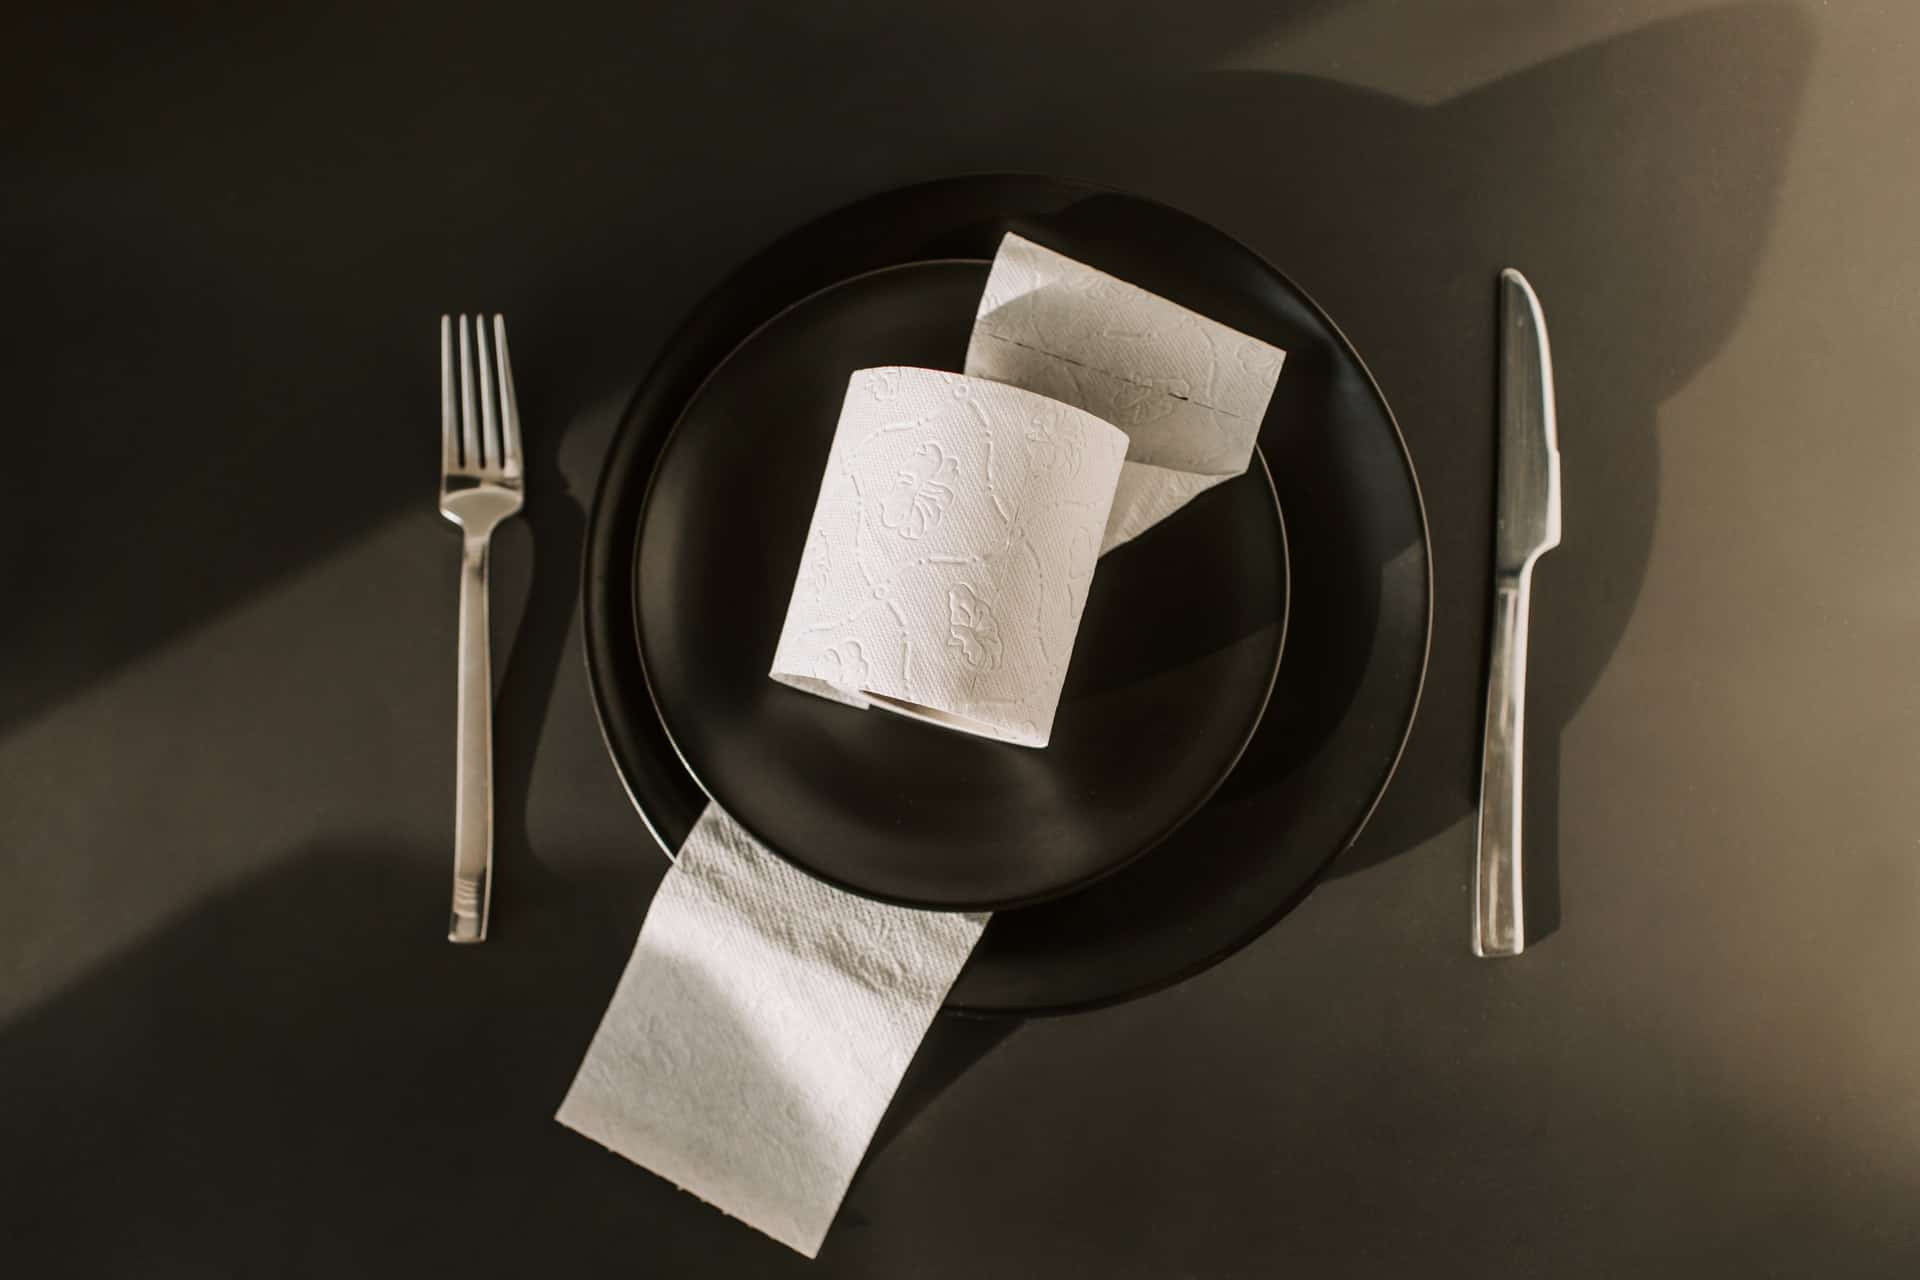 biodegradable tissue paper